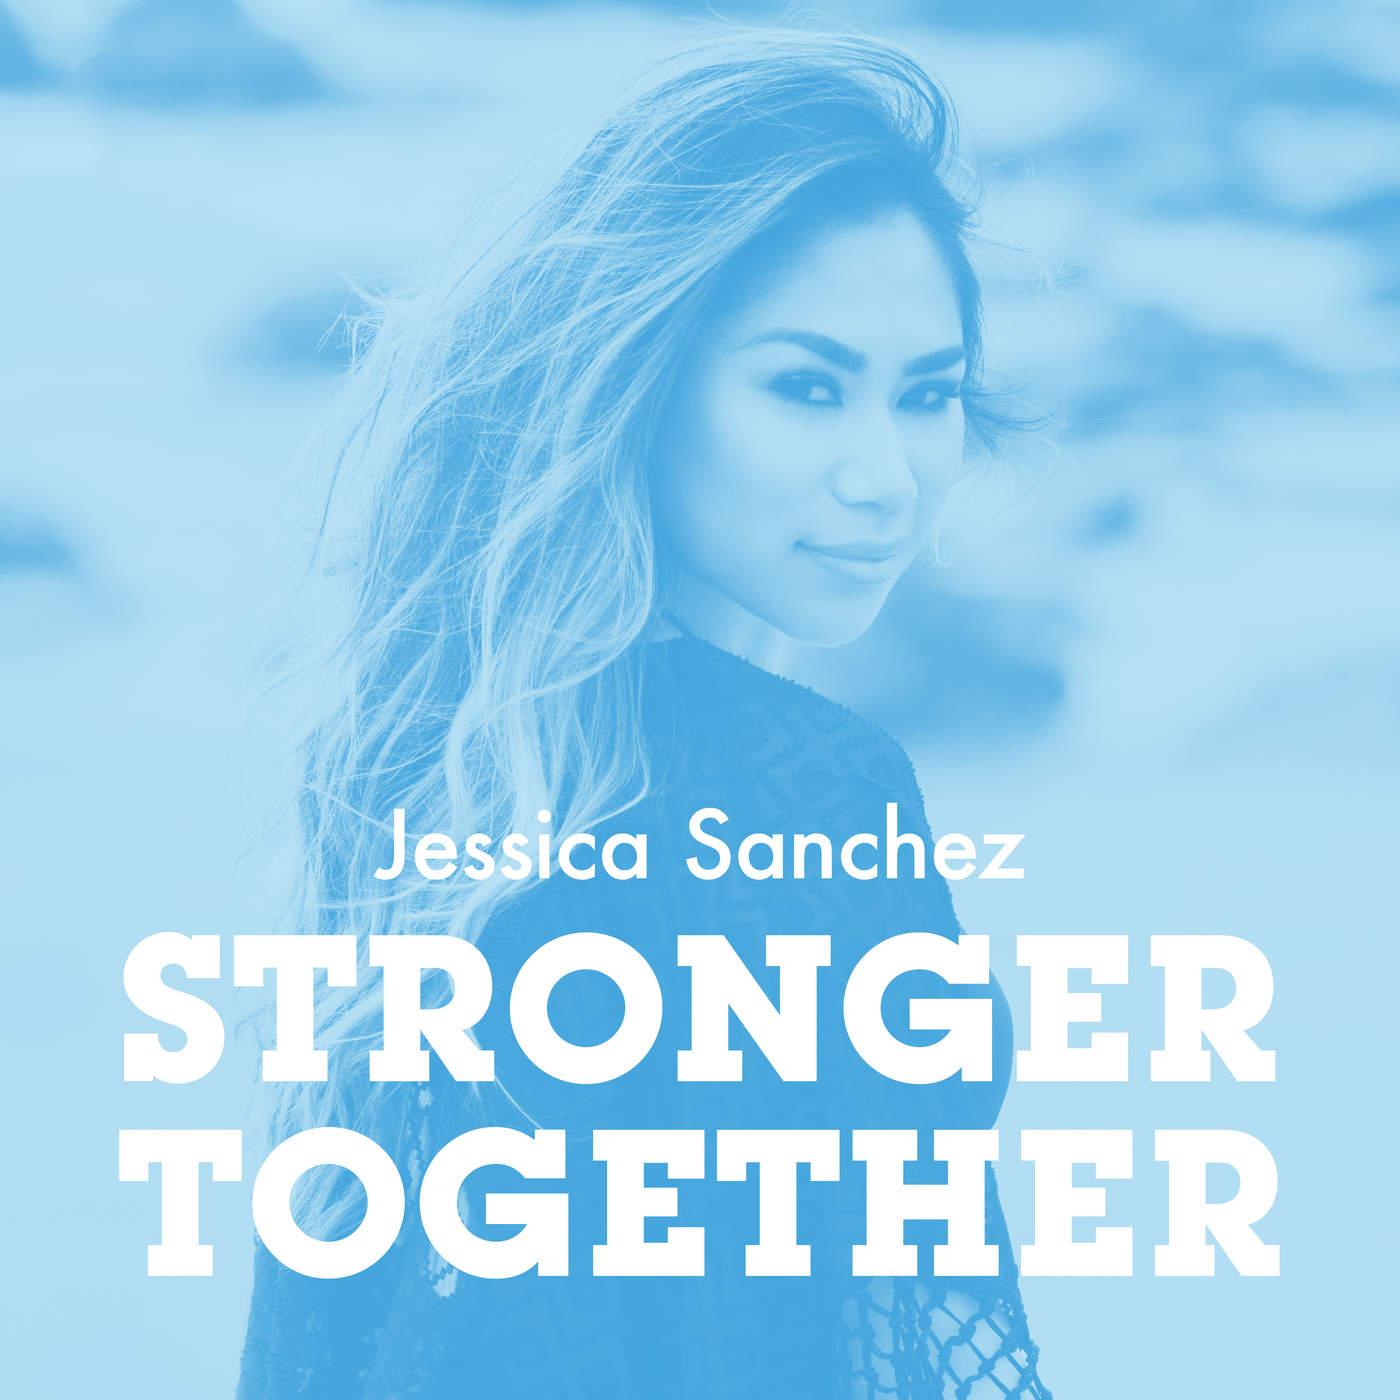 JessicaSanchez_StrongerTogetherSingle.jpg